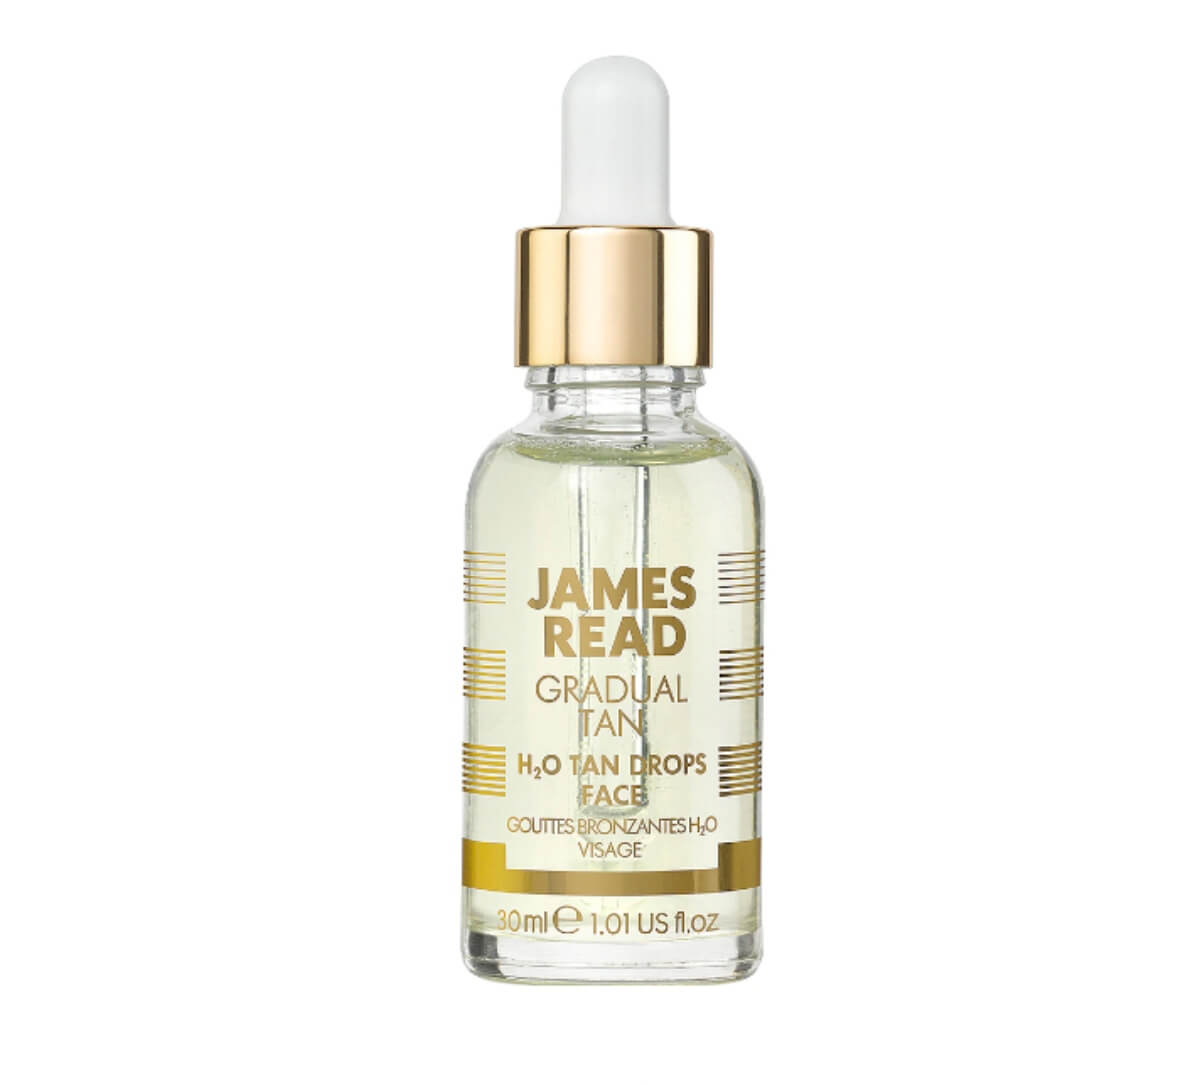 james read tan gradual tanning drops